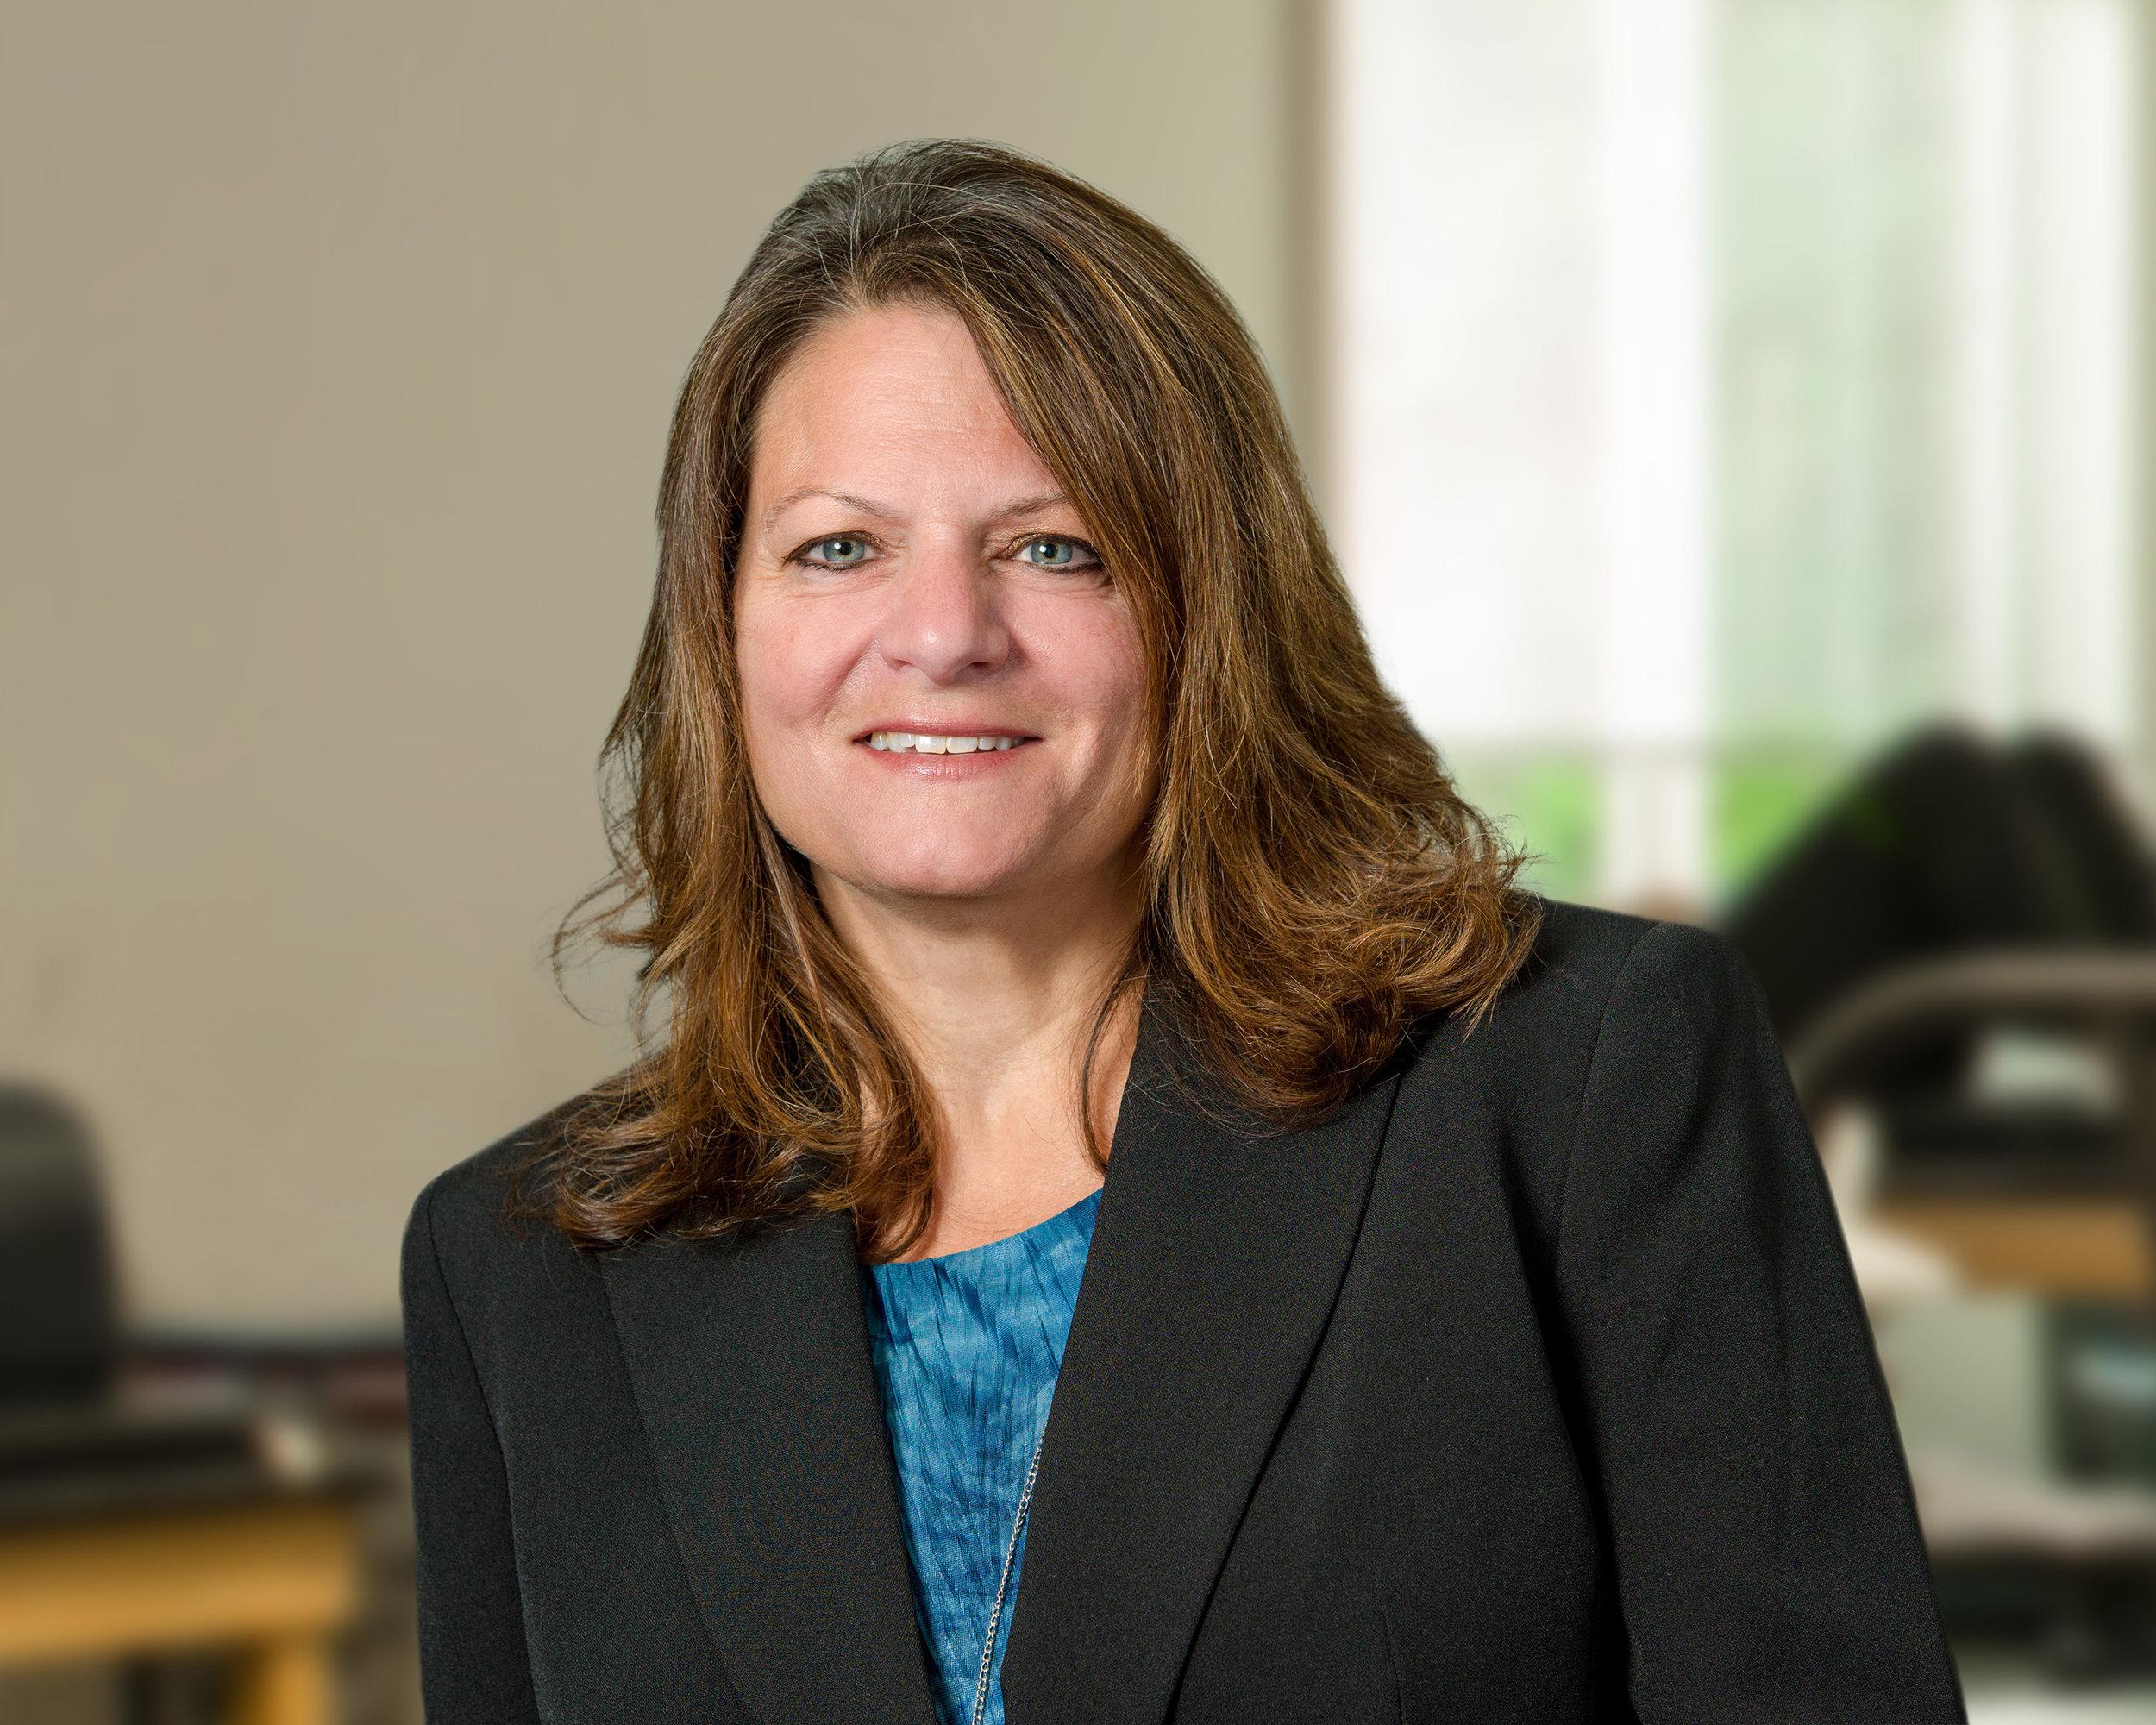 Andrea Nasso - Medical Biller / Credentialing Specialist